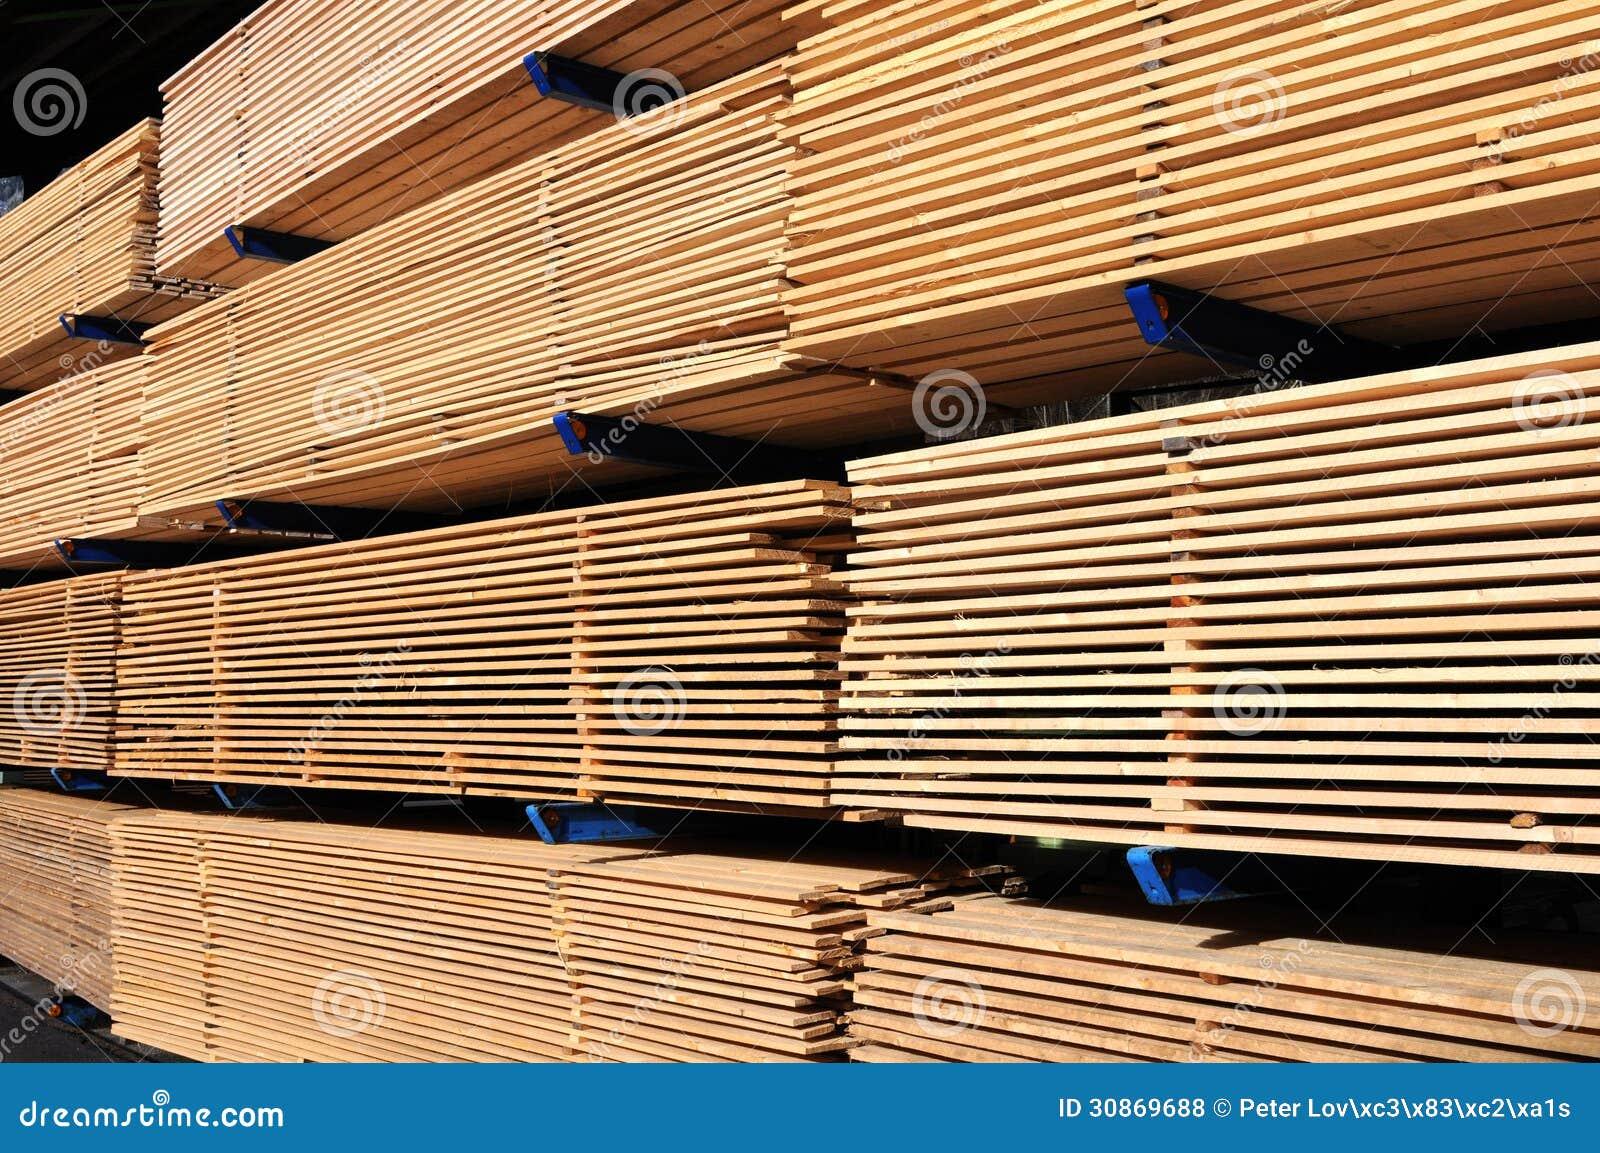 Lumber at a sawmill royalty free stock photos image